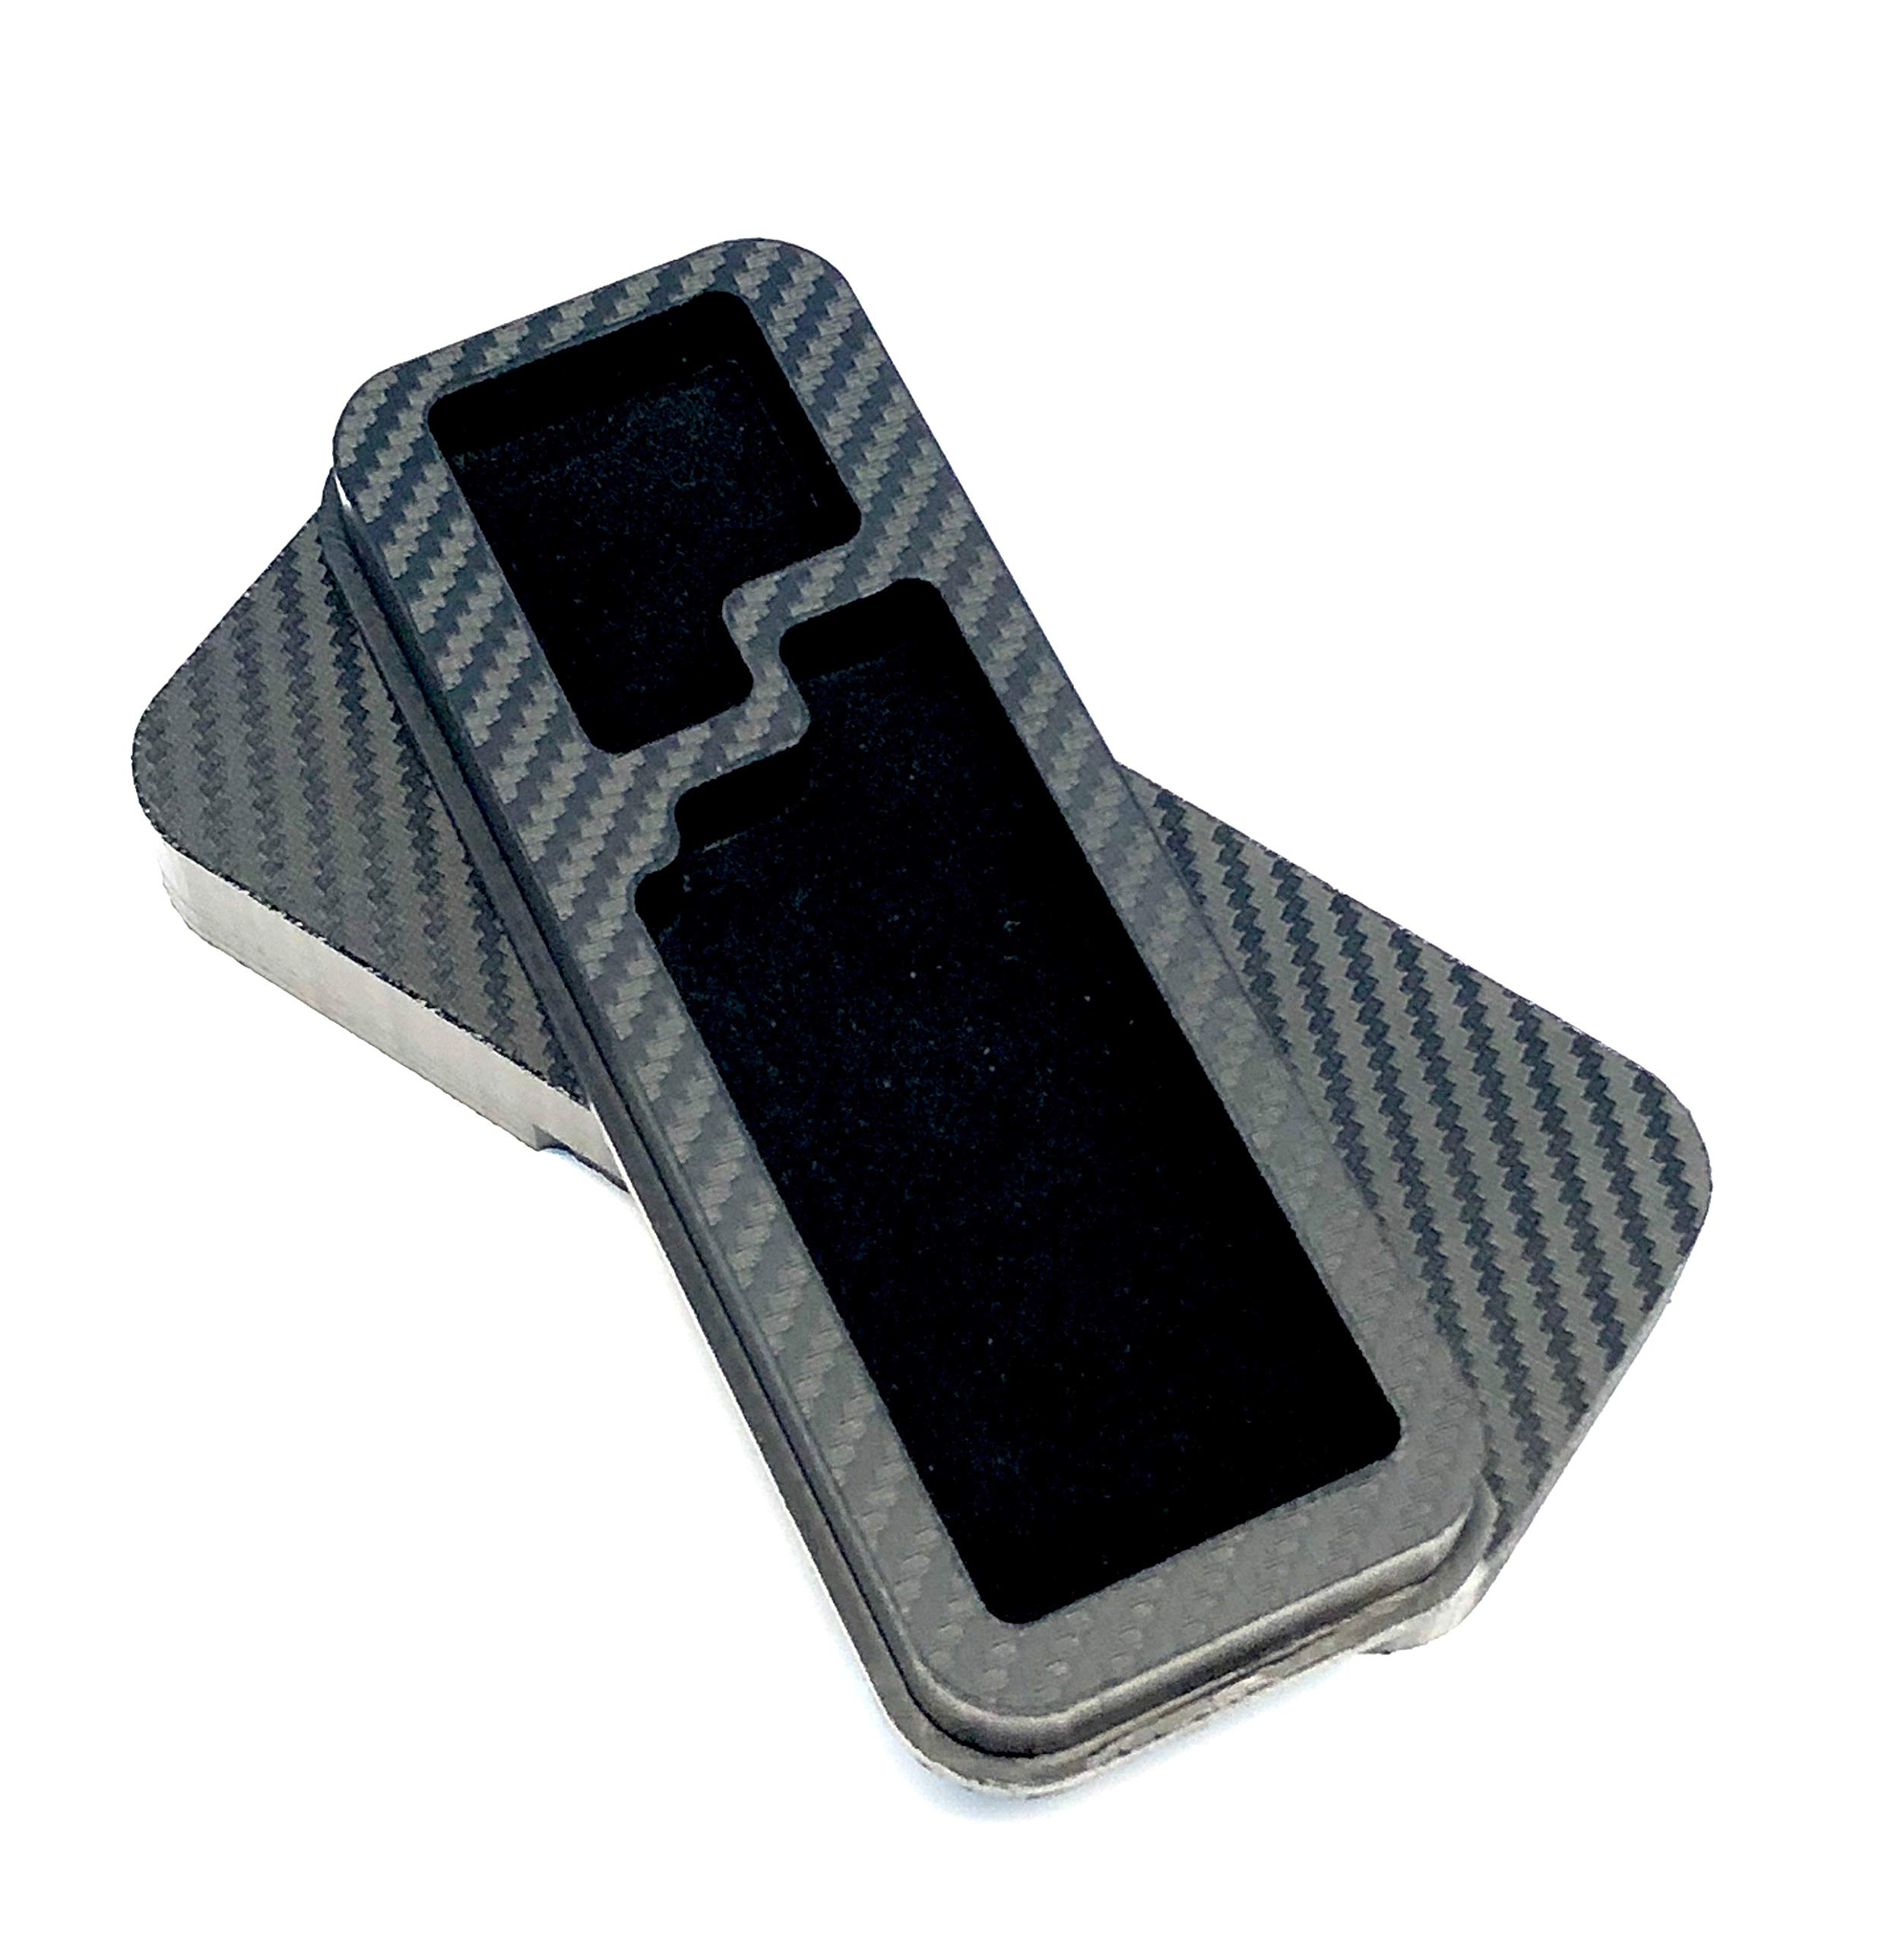 Lost Vape Orion DNA GO Pod CUP HOLDER by CushyMod cover wrap skin sleeve case car mod vape kit